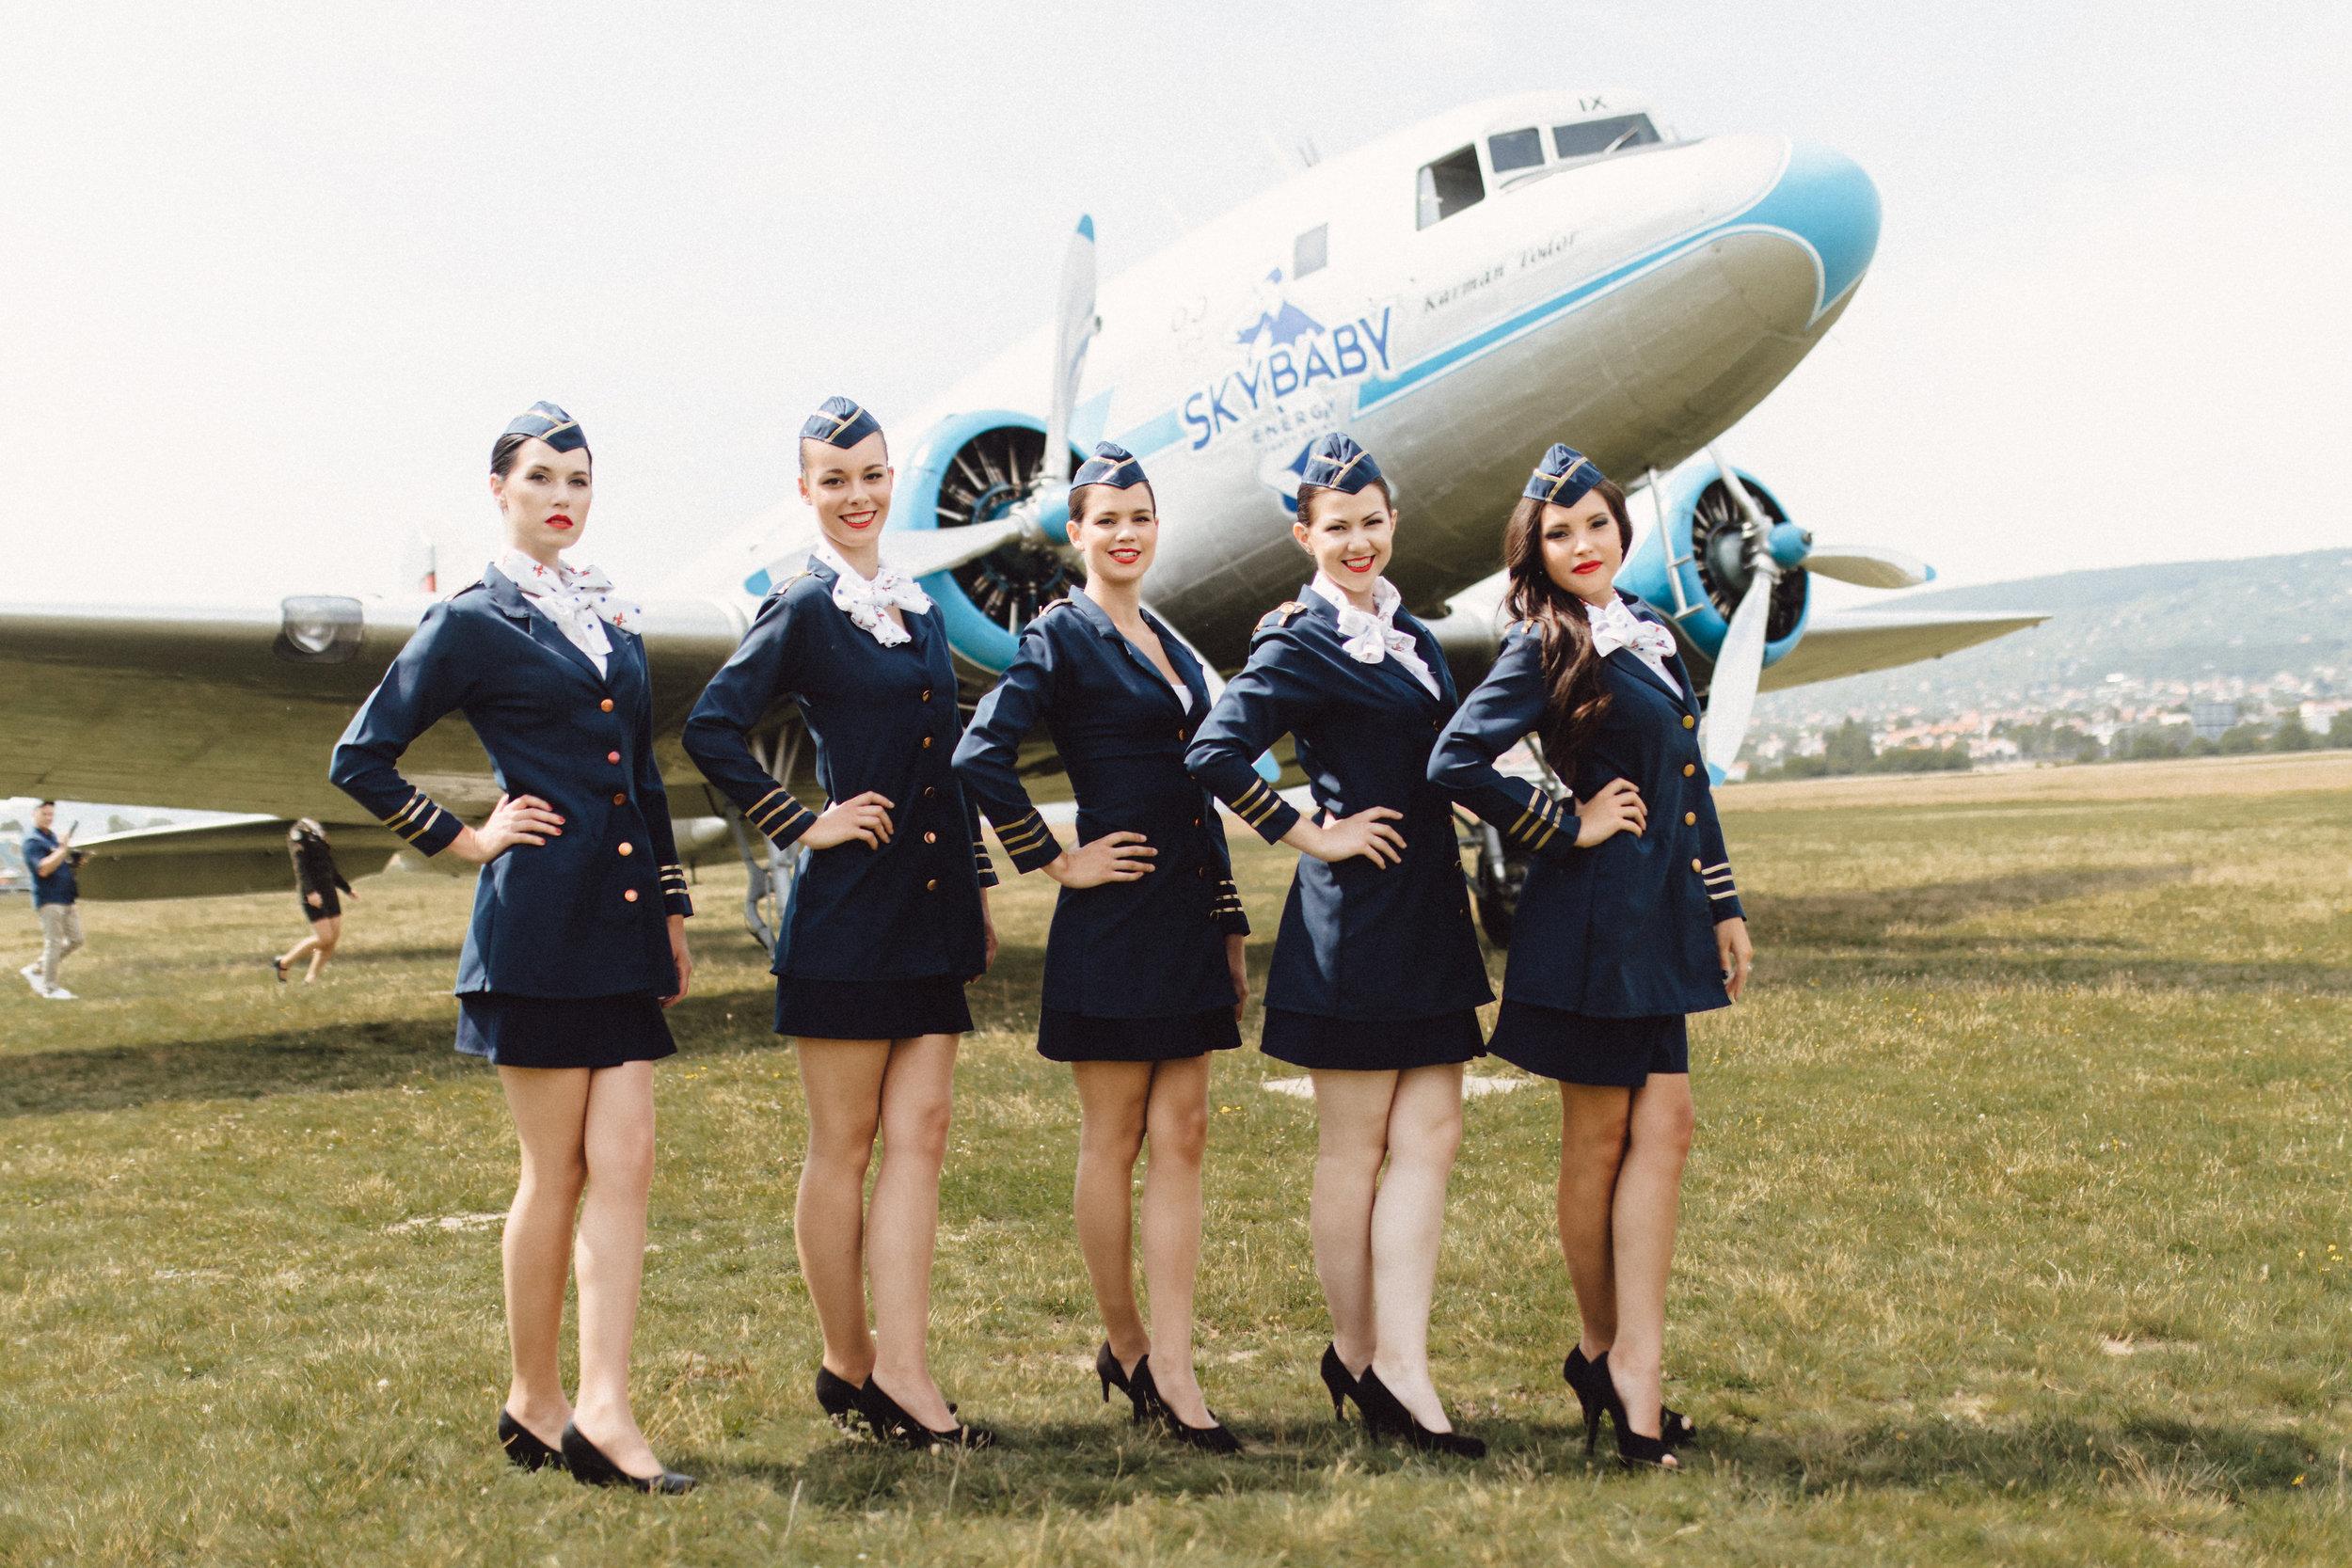 SKYBABY - Li-2 repülő hostessekkel.jpg